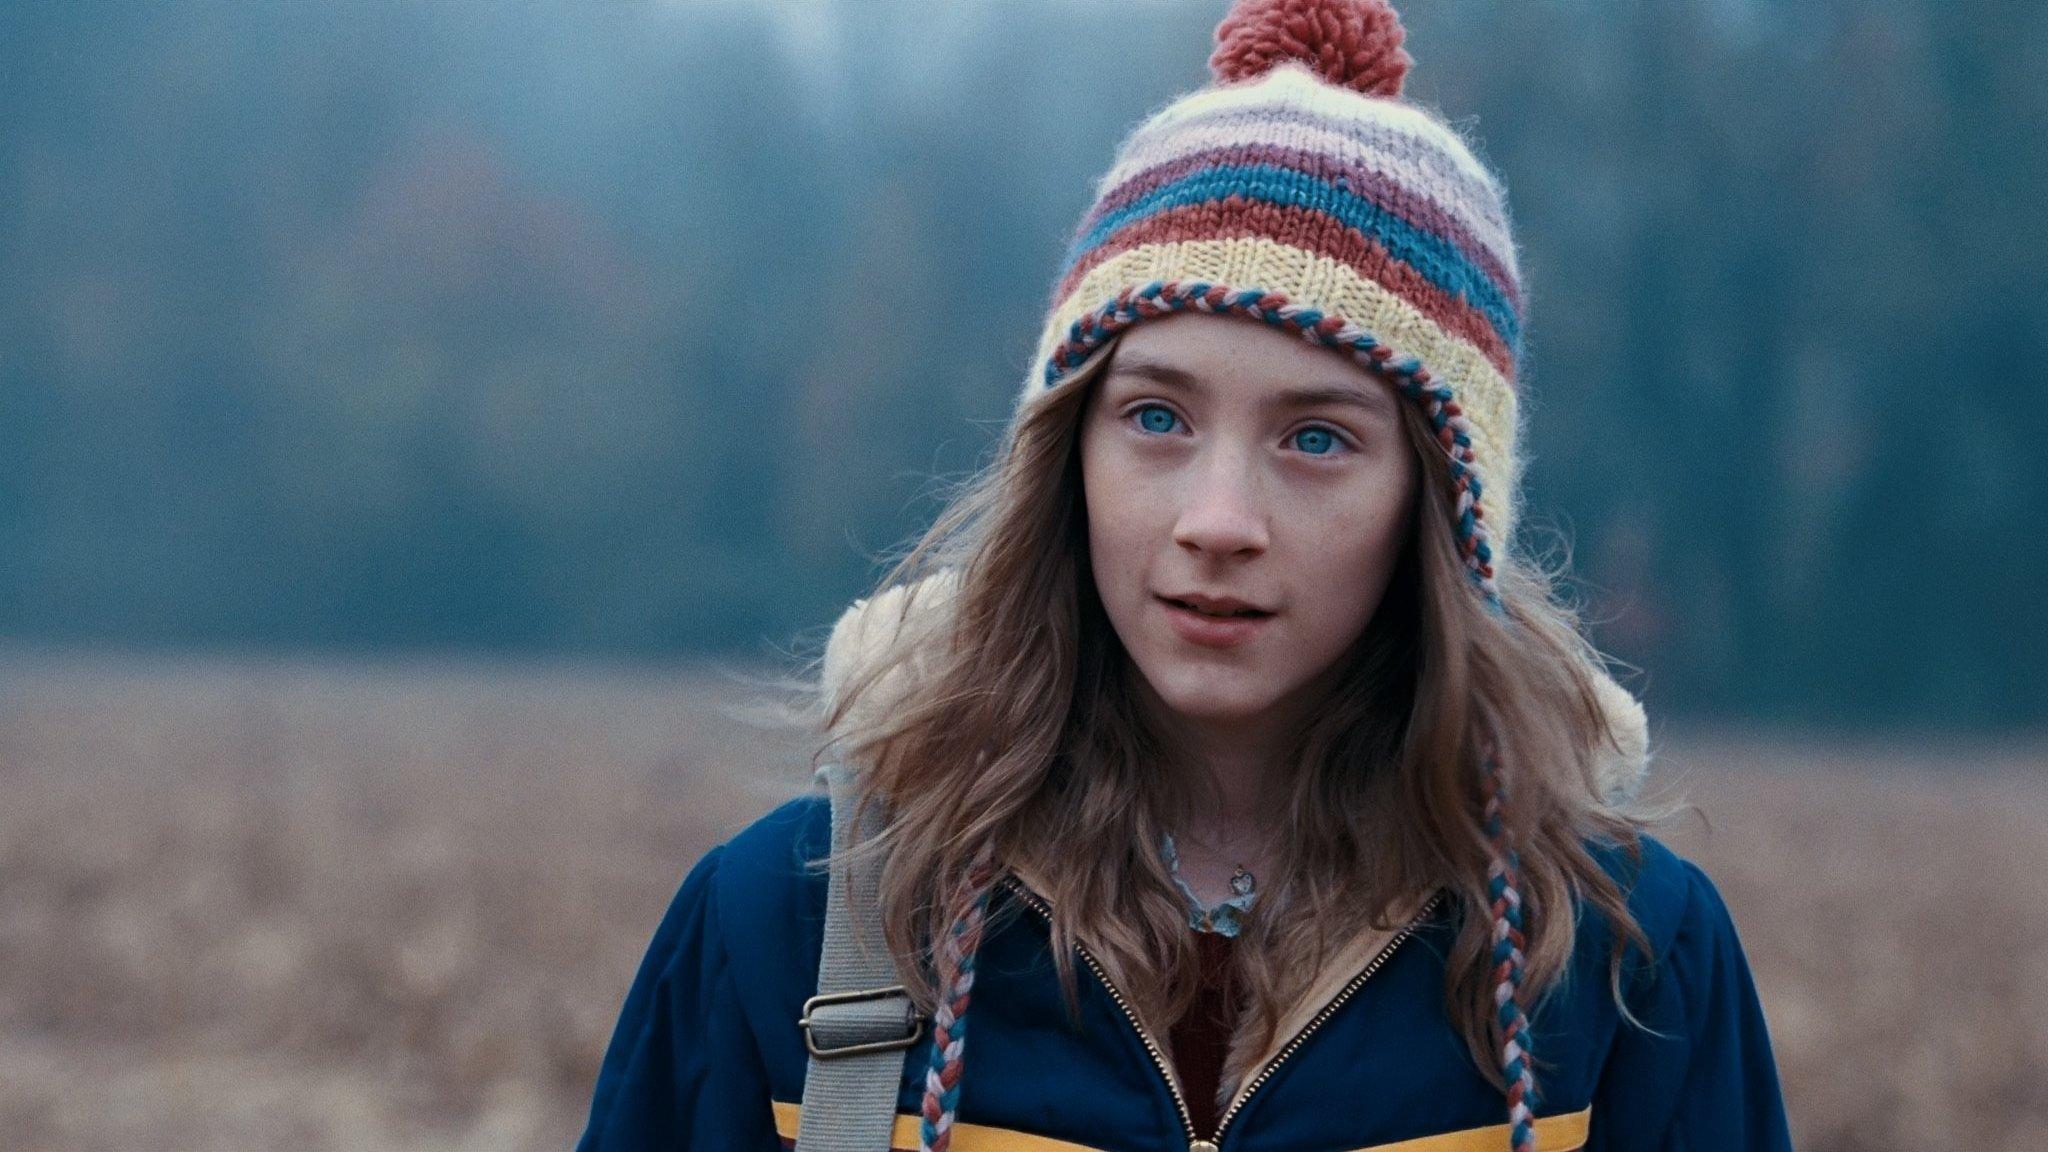 the-lovely-bones-the-lovely-bones-saoirse-ronan-saoirse-ronan-girl-actress-view-eyes-hat-the-field